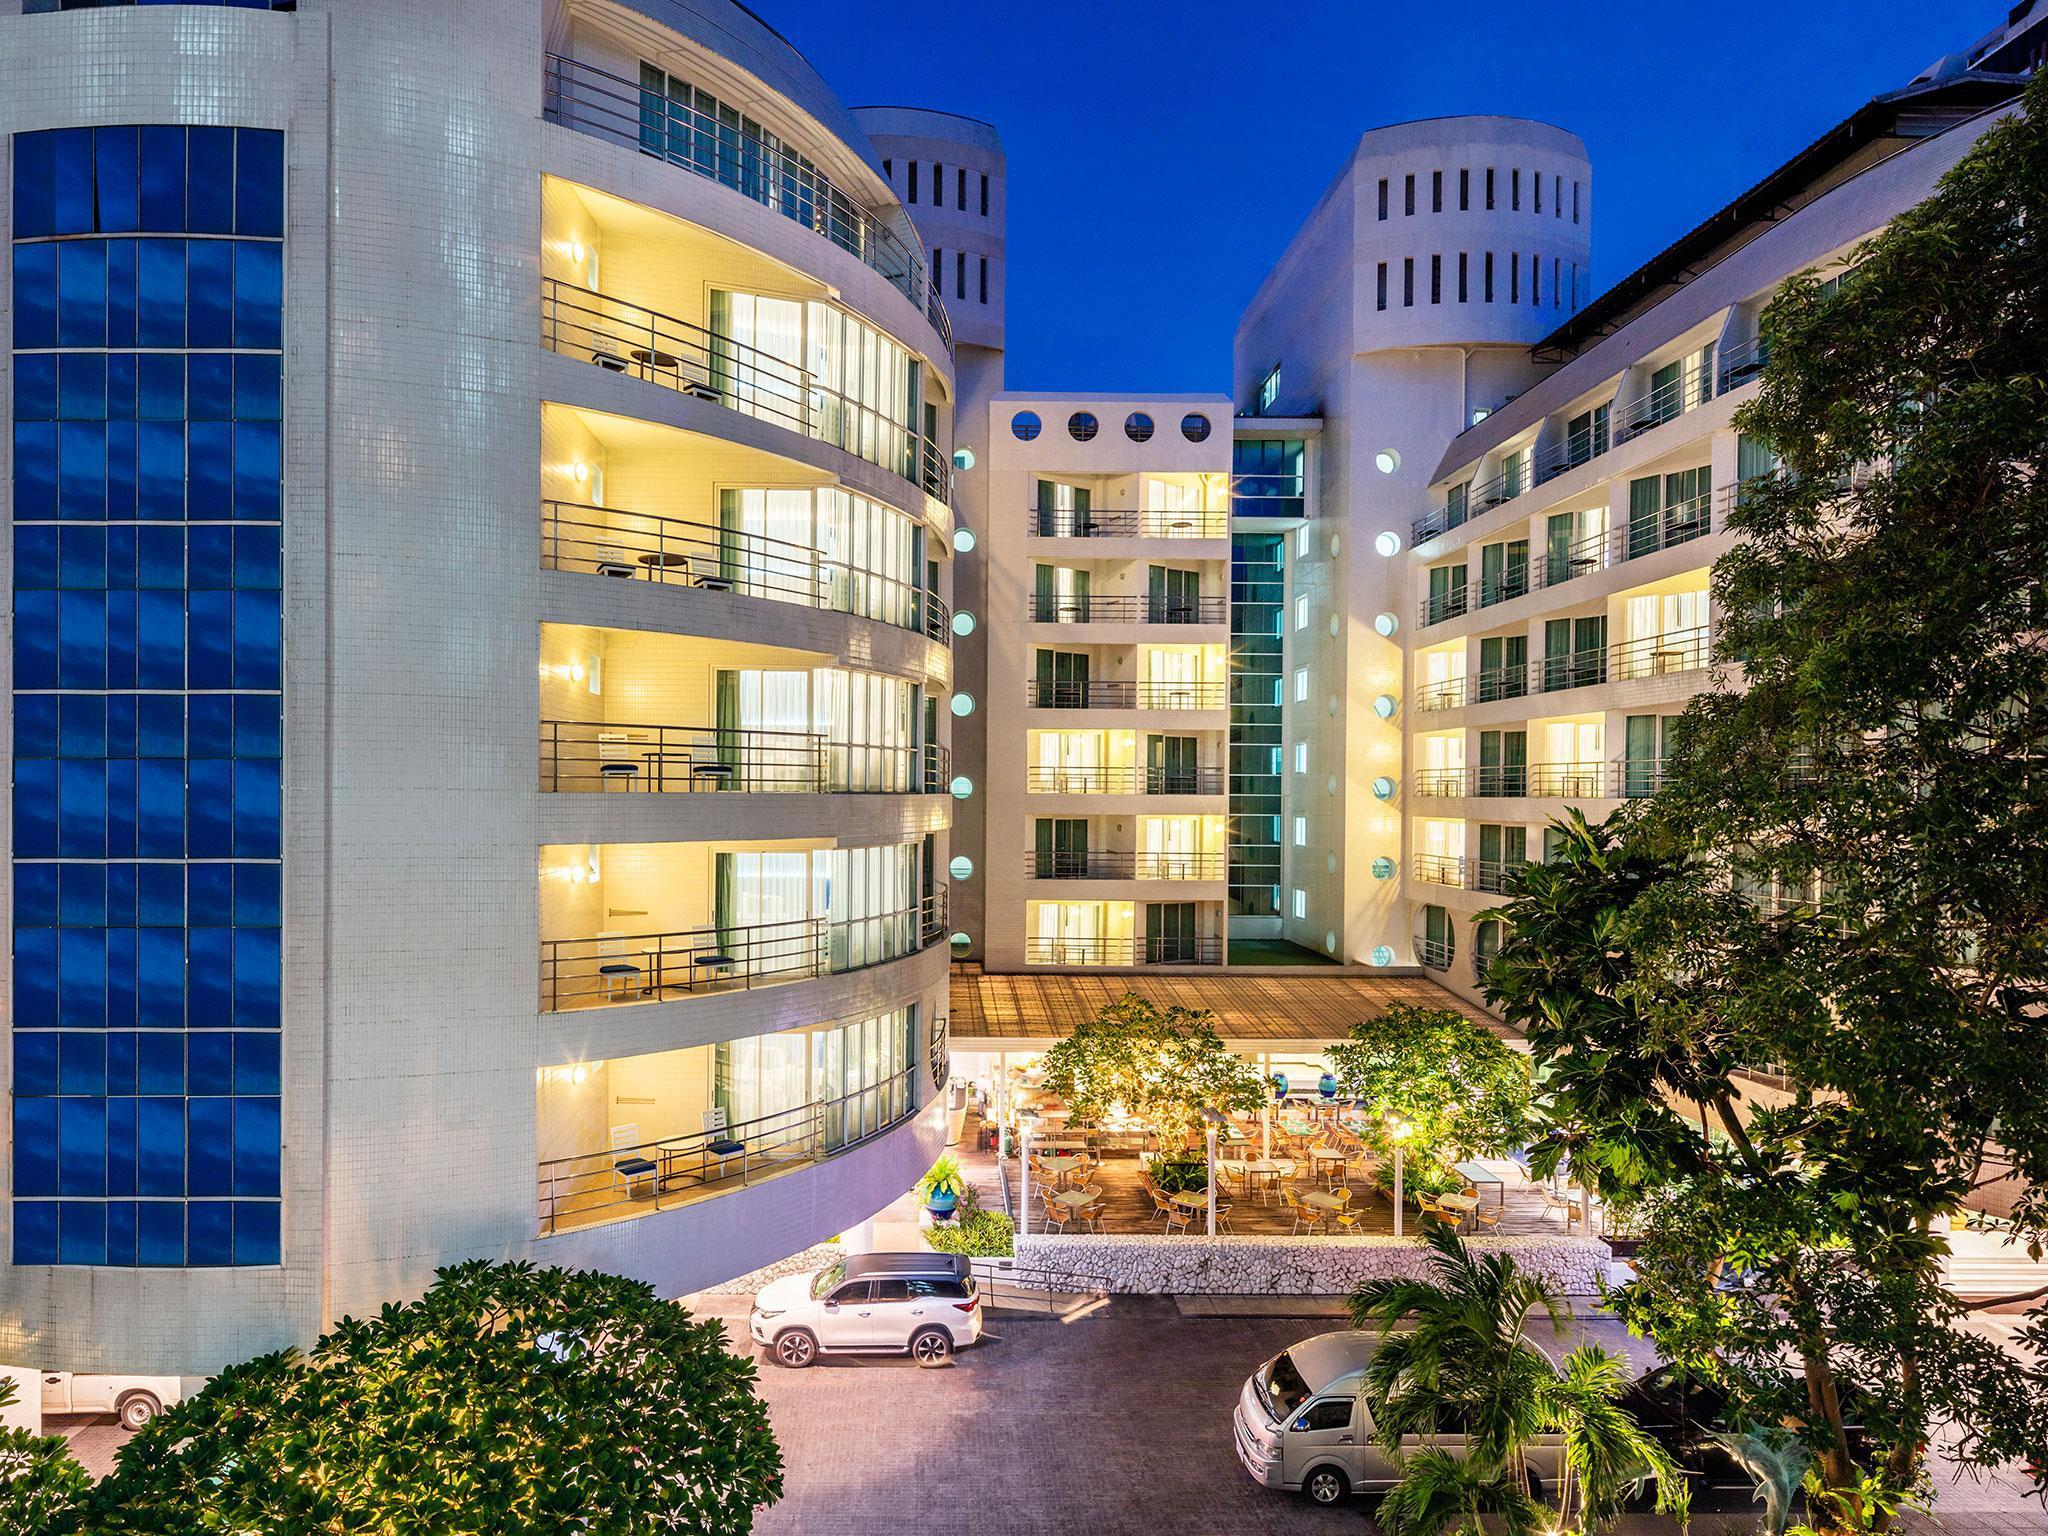 A-One New Wing Hotel โรงแรมเอ-วัน นิววิง